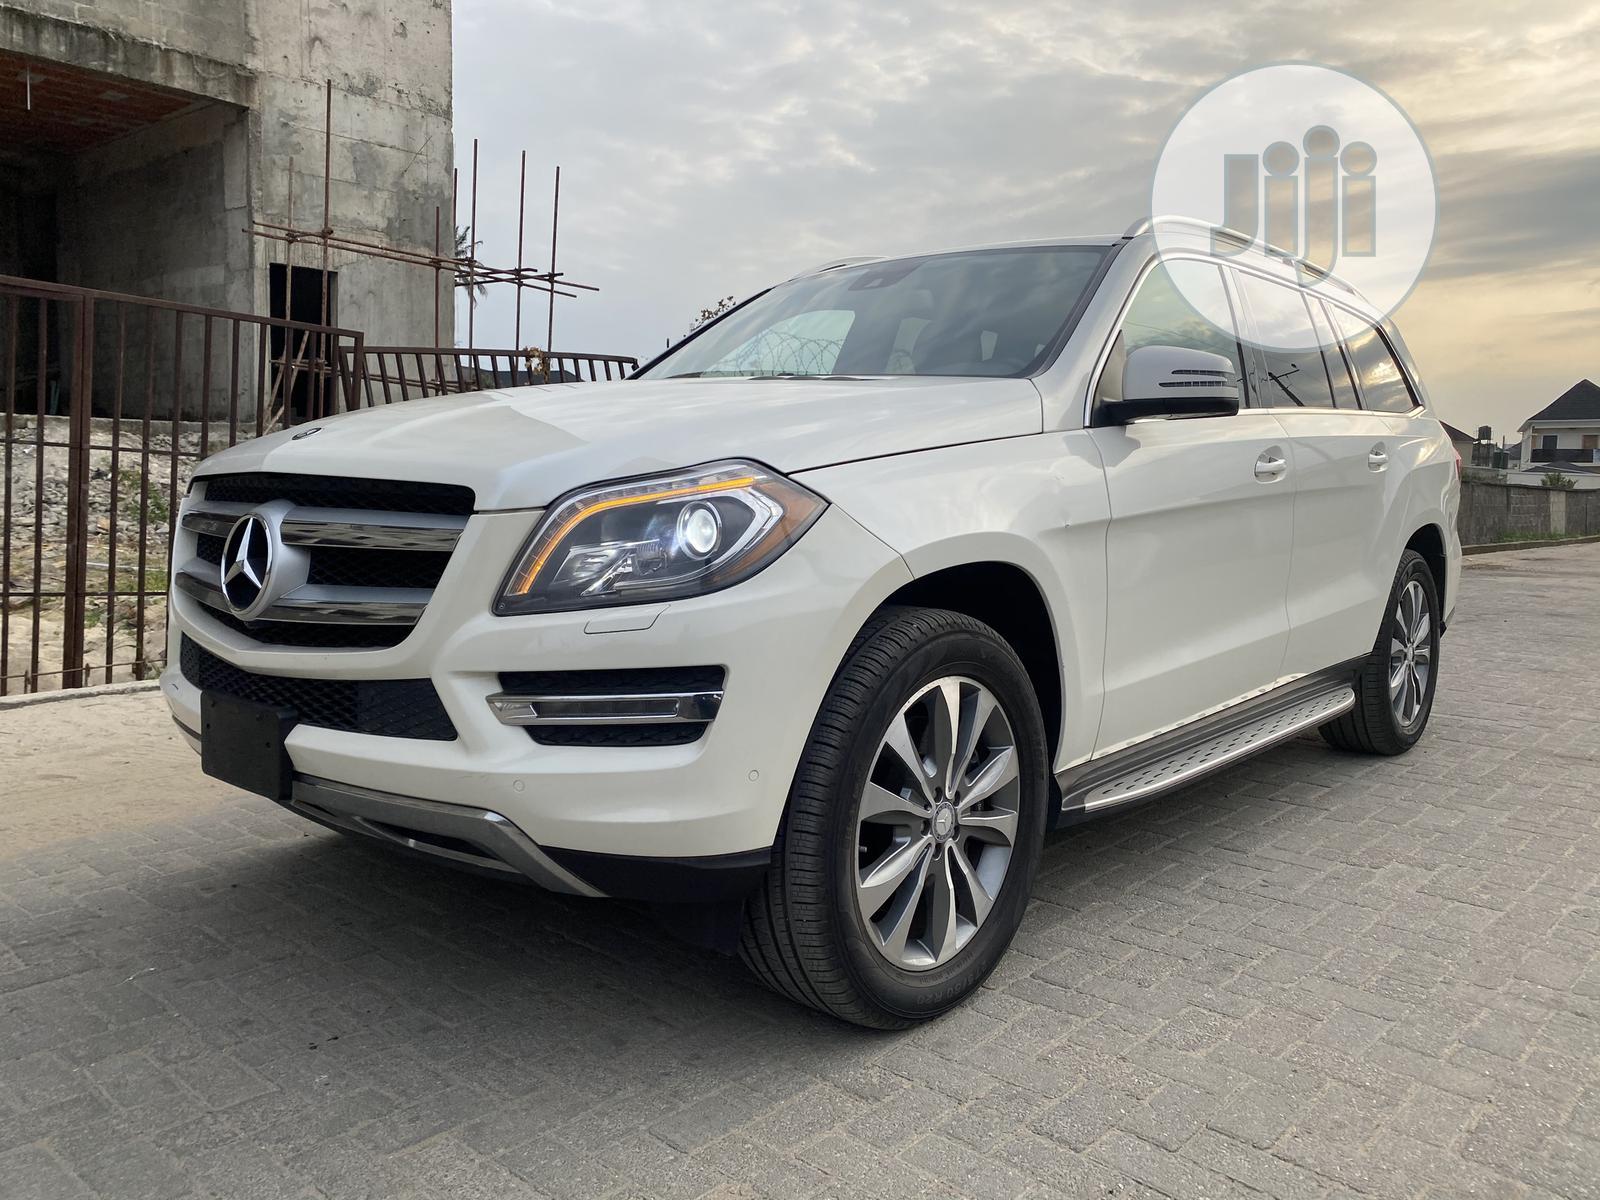 Mercedes-Benz GL Class 2013 White | Cars for sale in Lekki, Lagos State, Nigeria